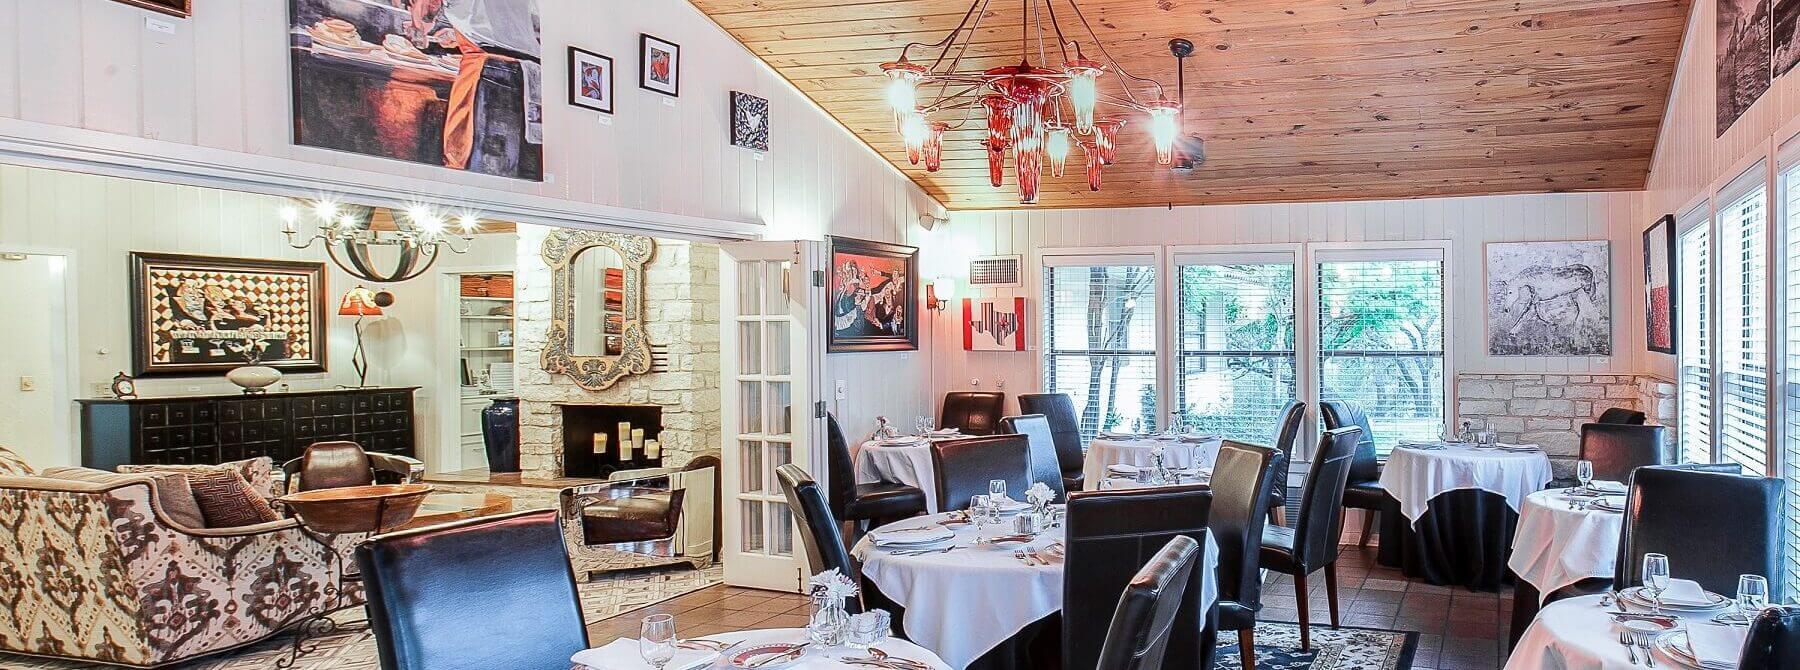 Blair-House-Inn-Main-Lodge-Dining-Room-1800x670